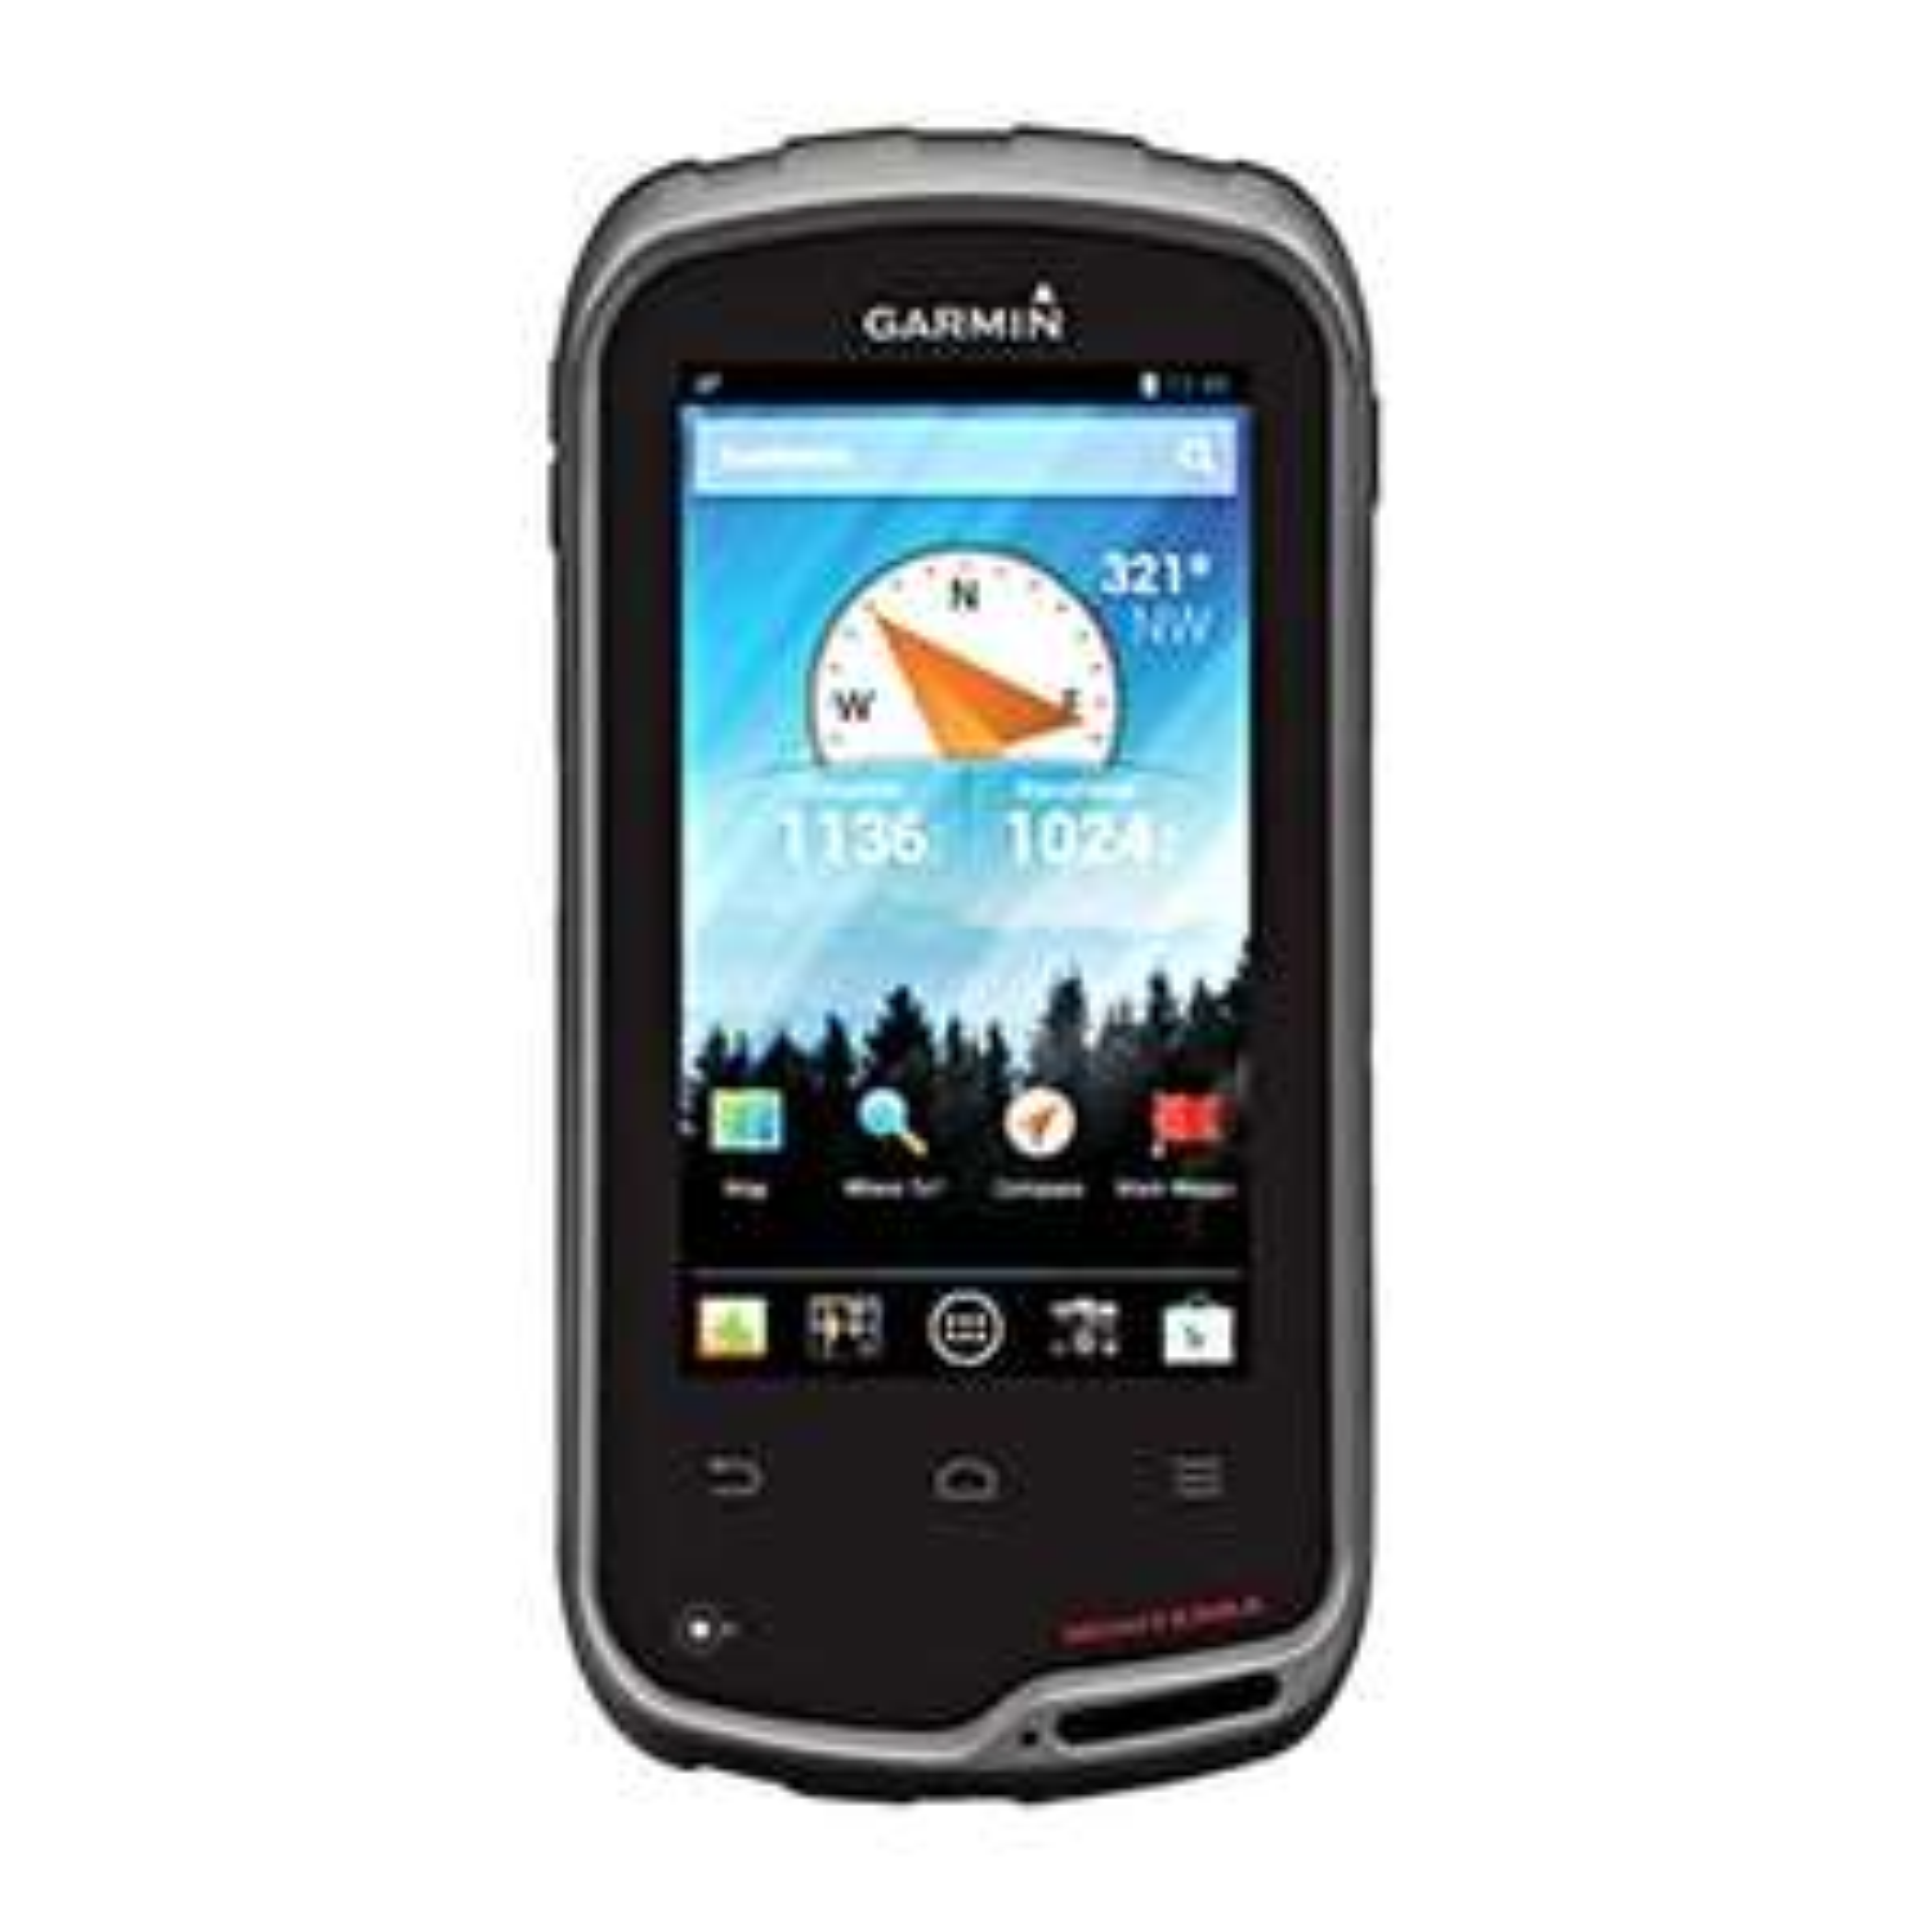 [Globetrotter] GPS Gerät Garmin Monterra inkl. Freizeitguide Europa (Wander-Navi, 4 Zoll, 8MP Kamera, HD Video, Taschenlampe)